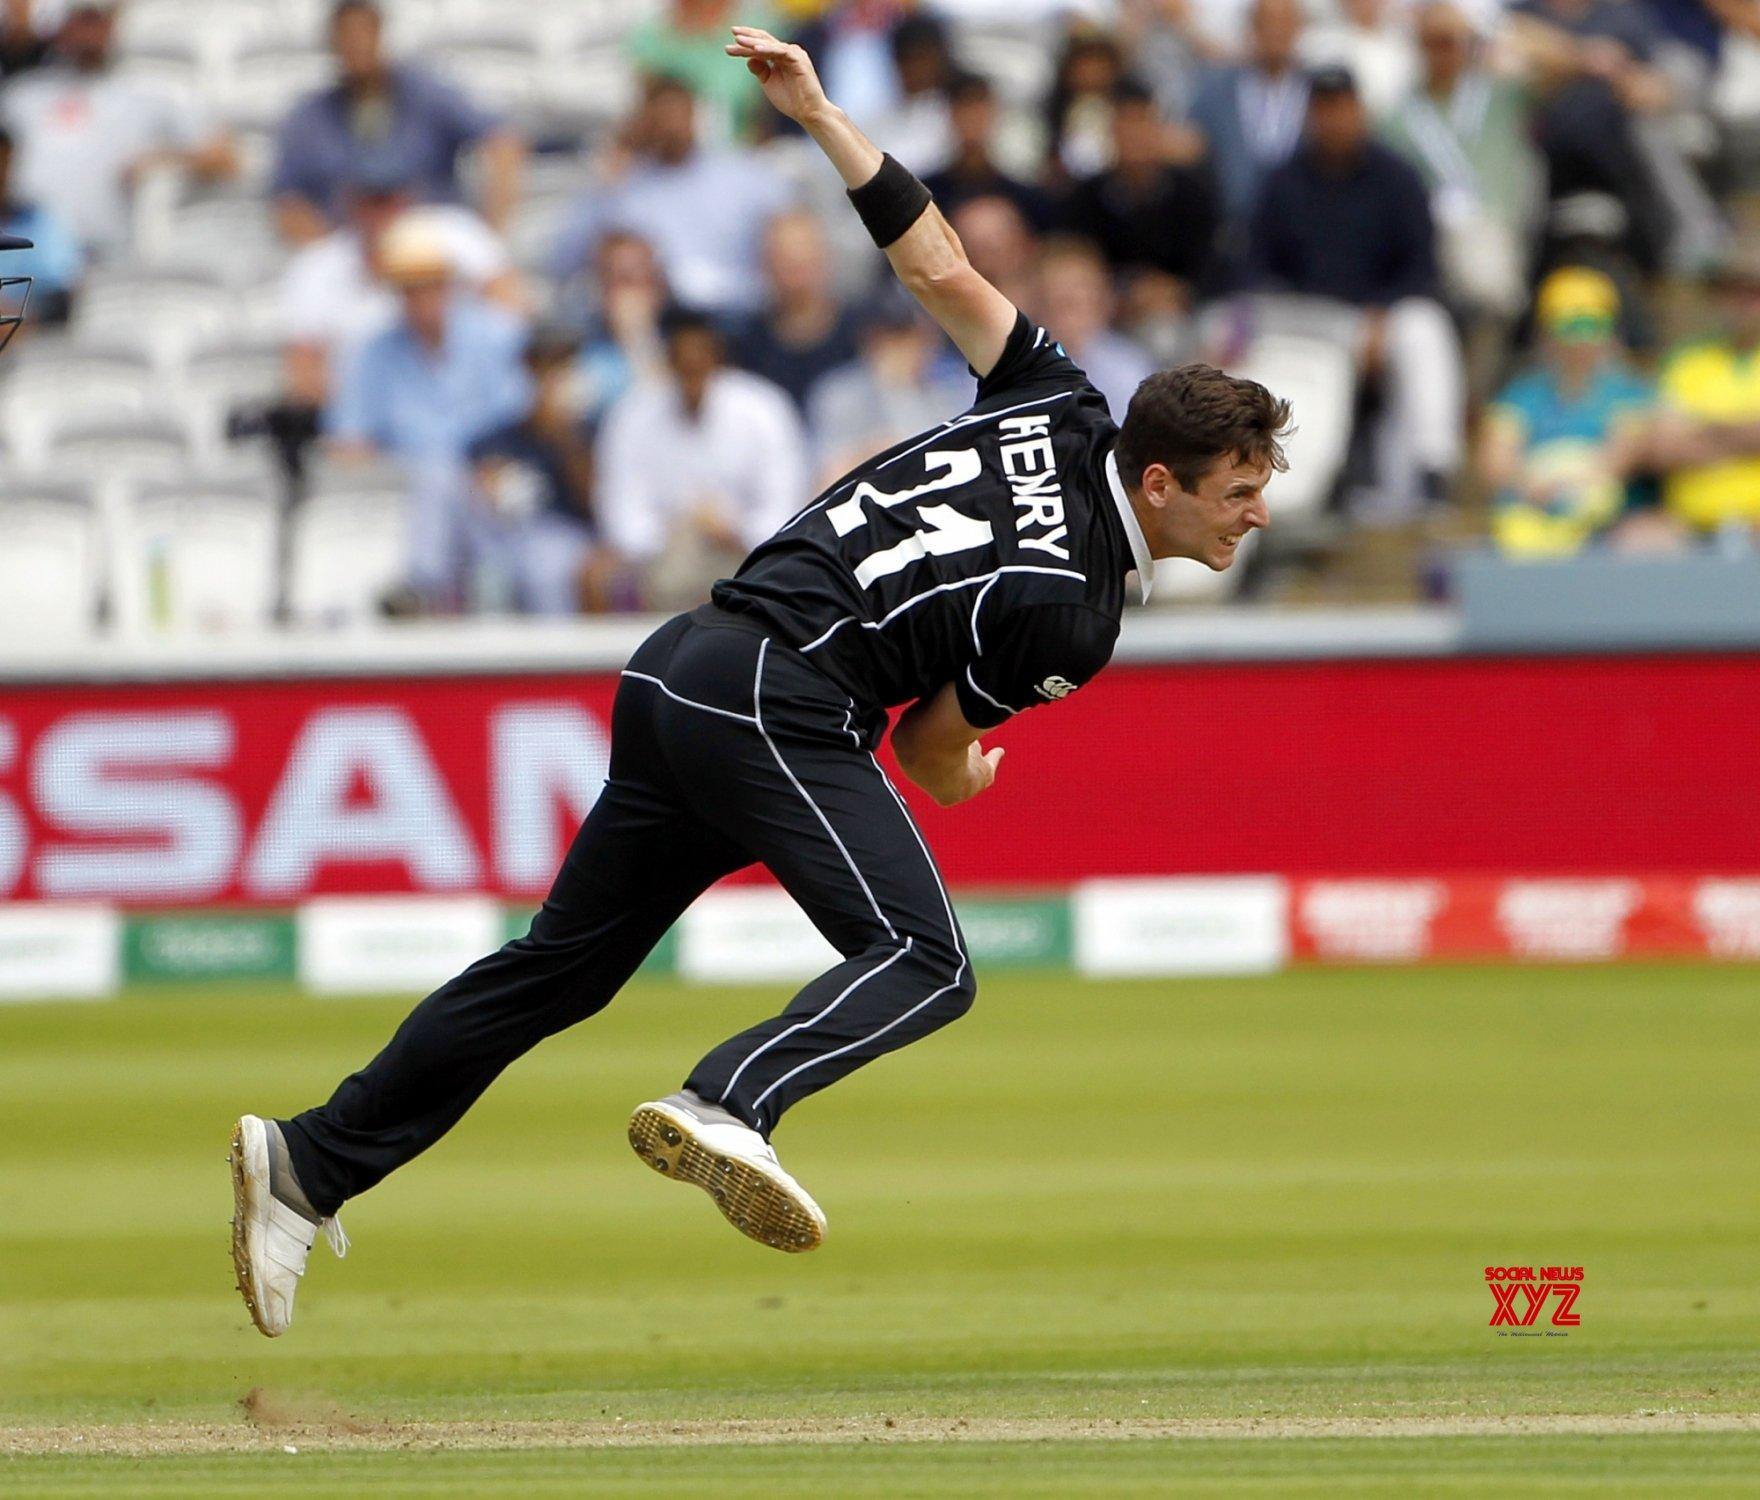 London (England): 2019 World Cup - Final - New Zealand Vs England (Batch - 32) #Gallery